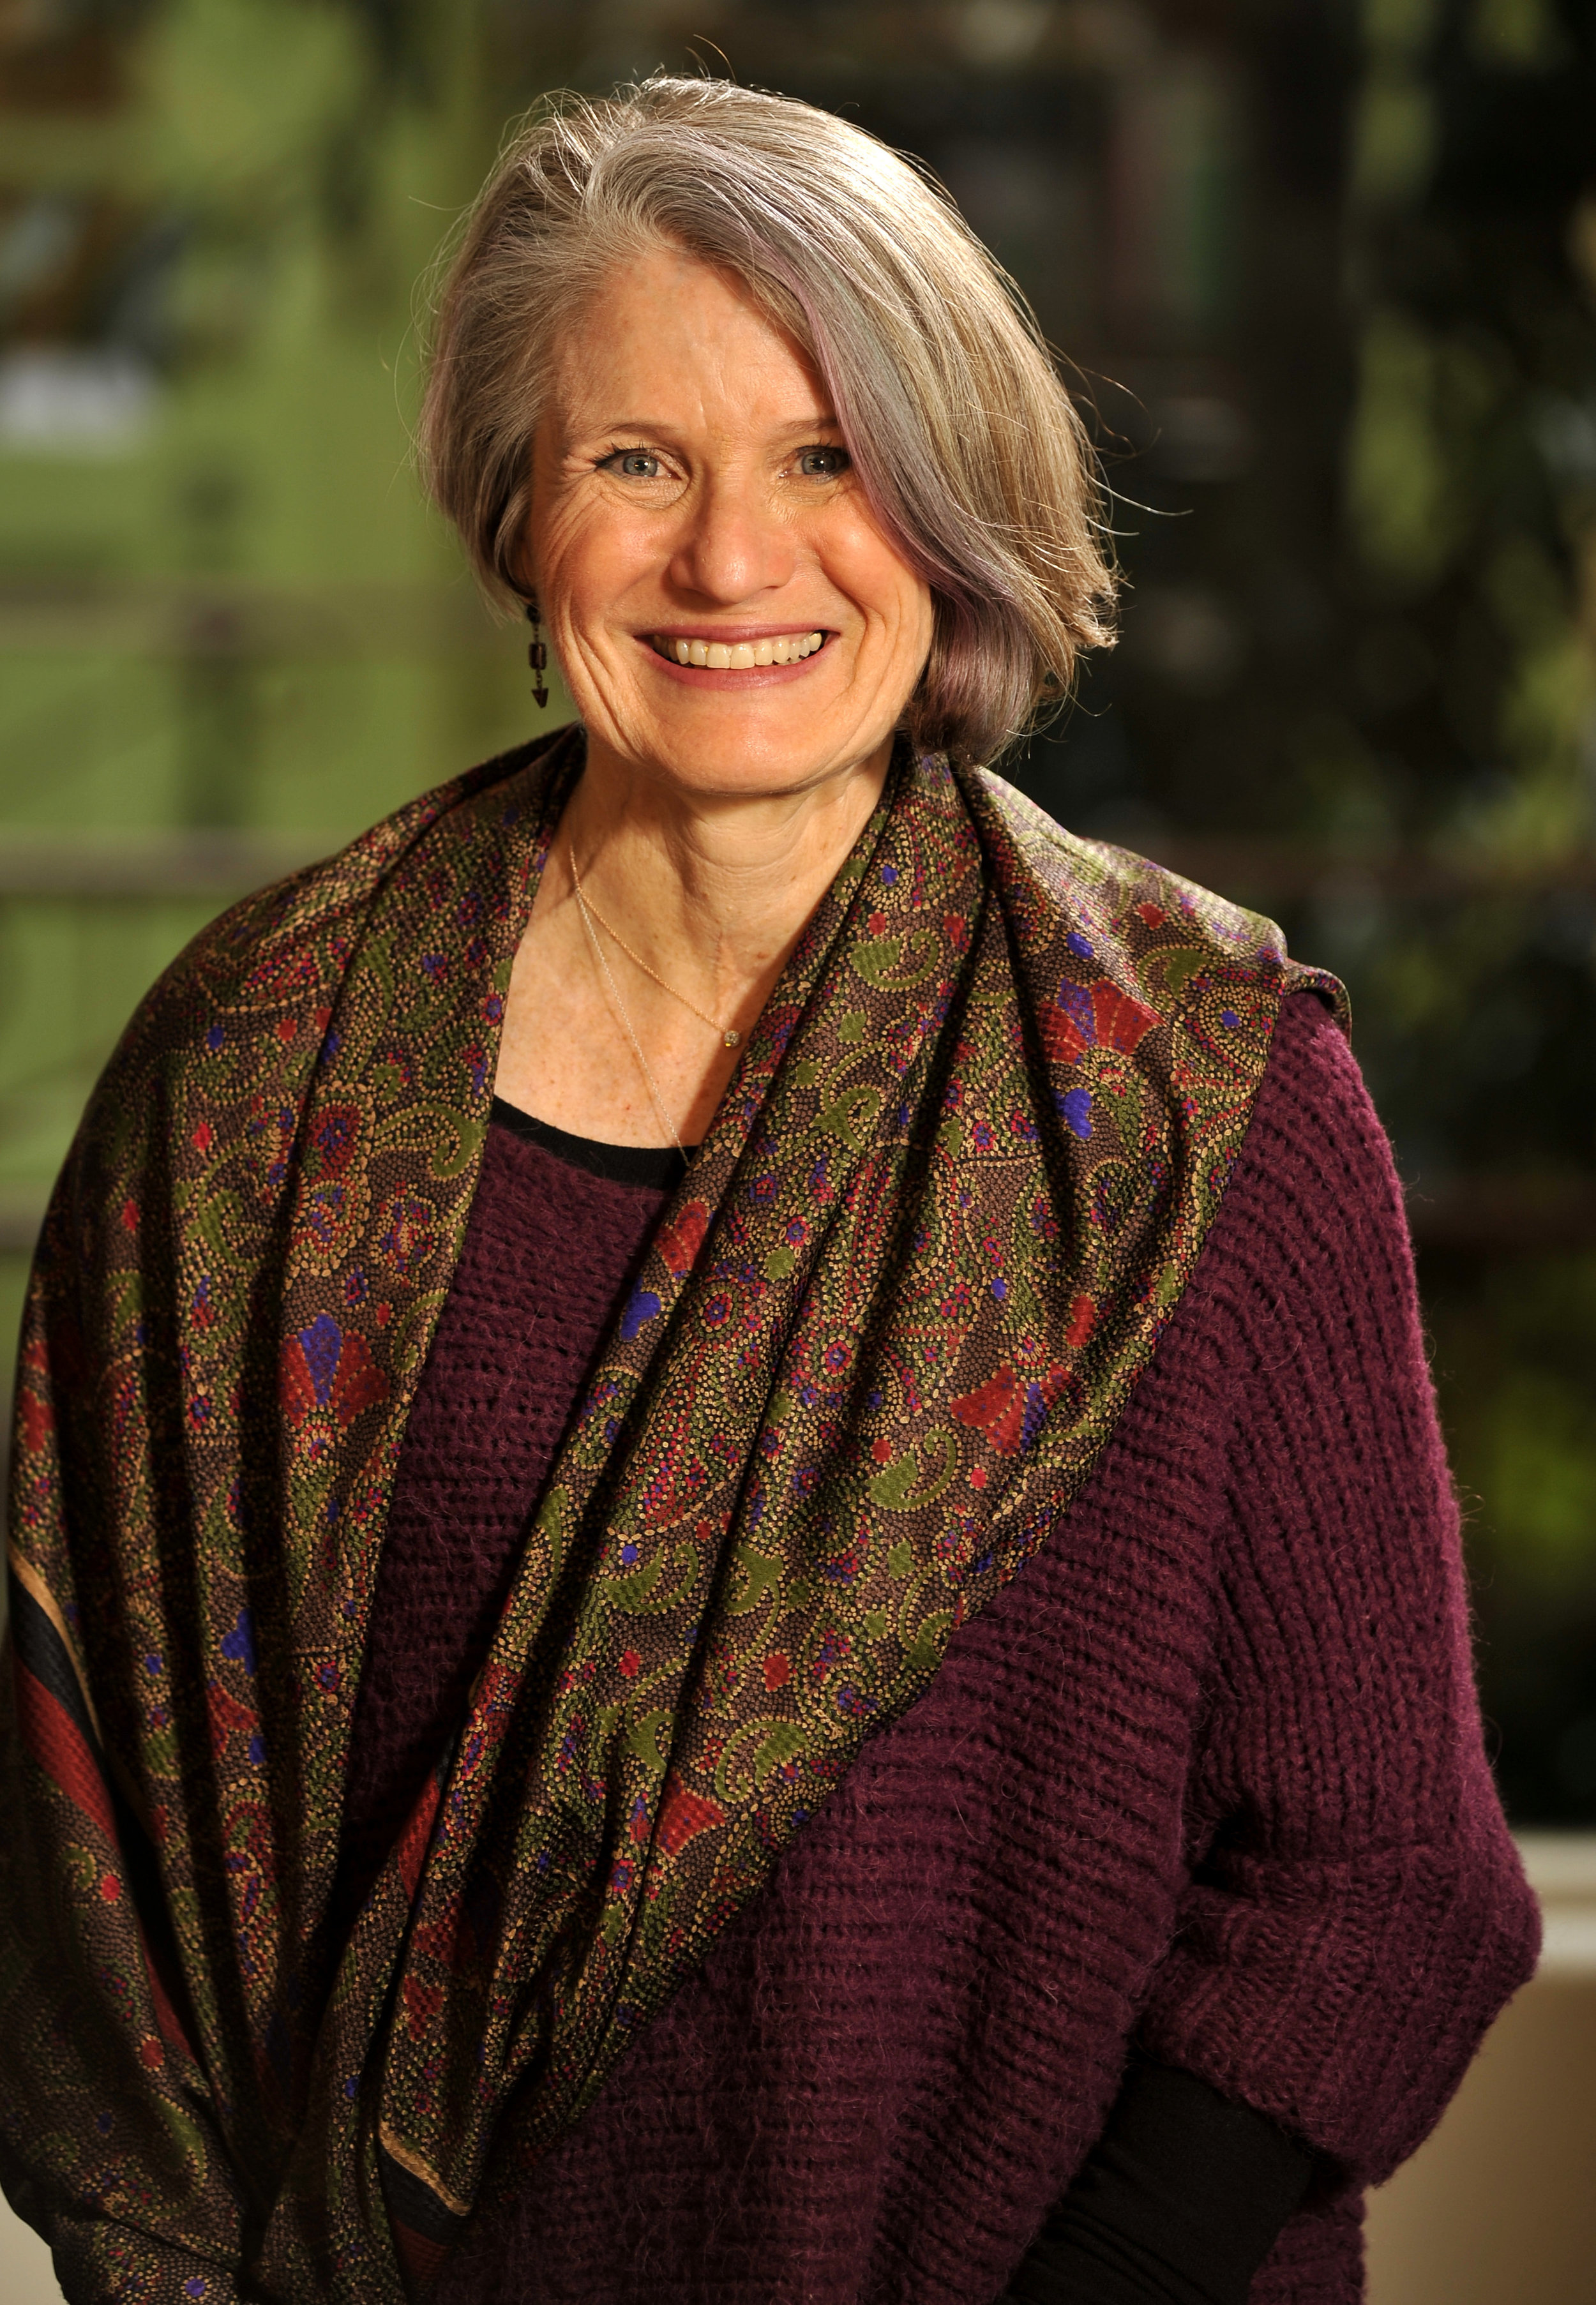 Jill Govan BaumanPresident and CEO - jill@imaginela.org